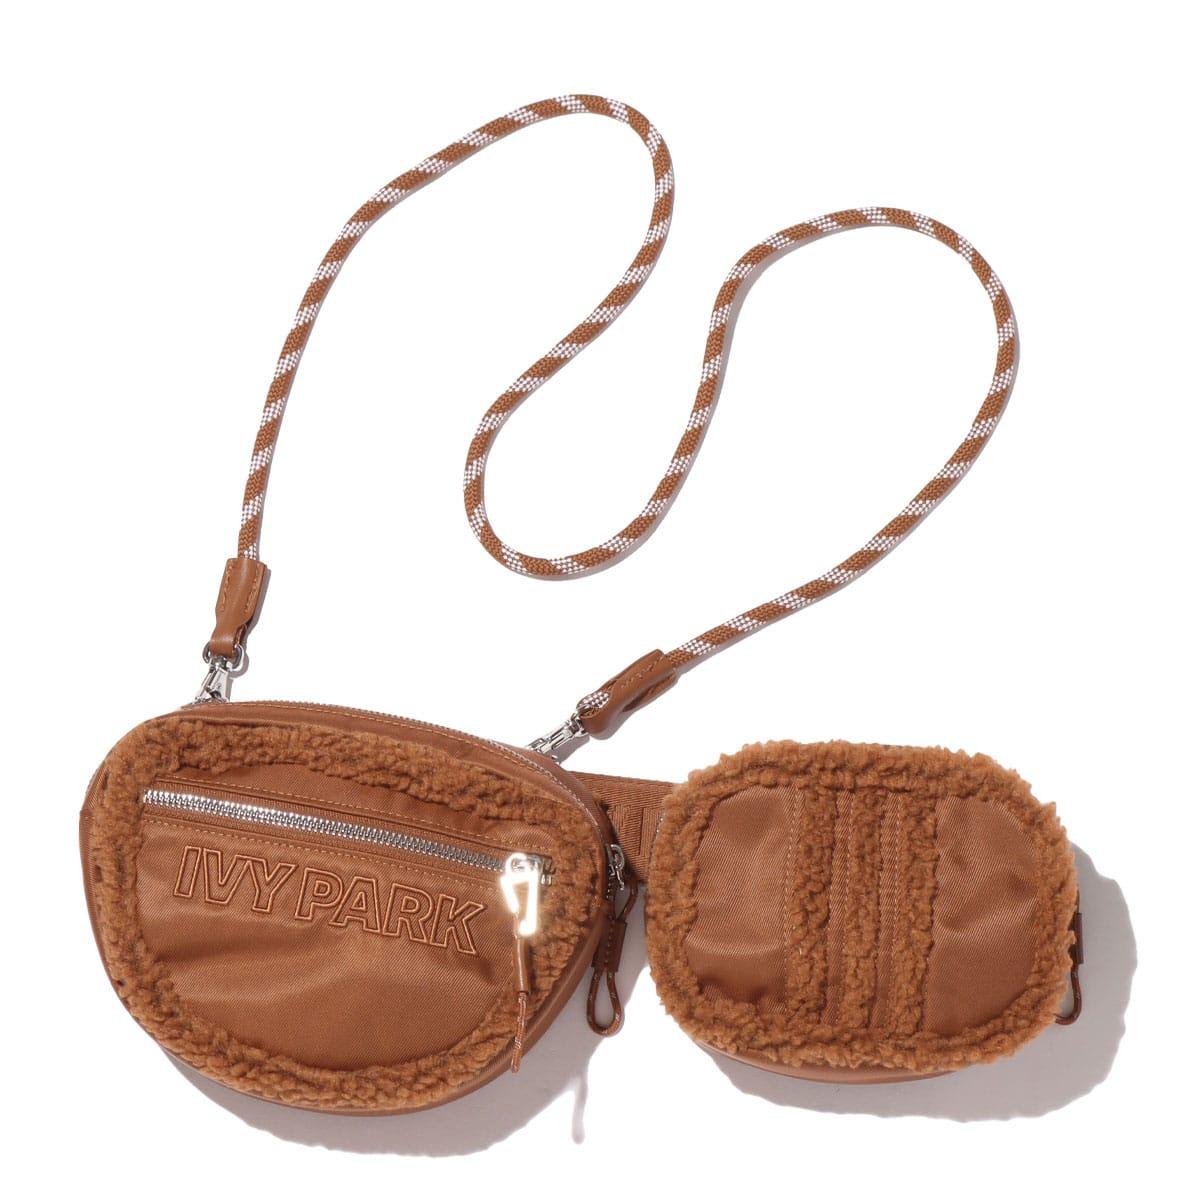 adidas IVP Sh Belt Bag ワイルドブラウン 21SS-S_photo_large